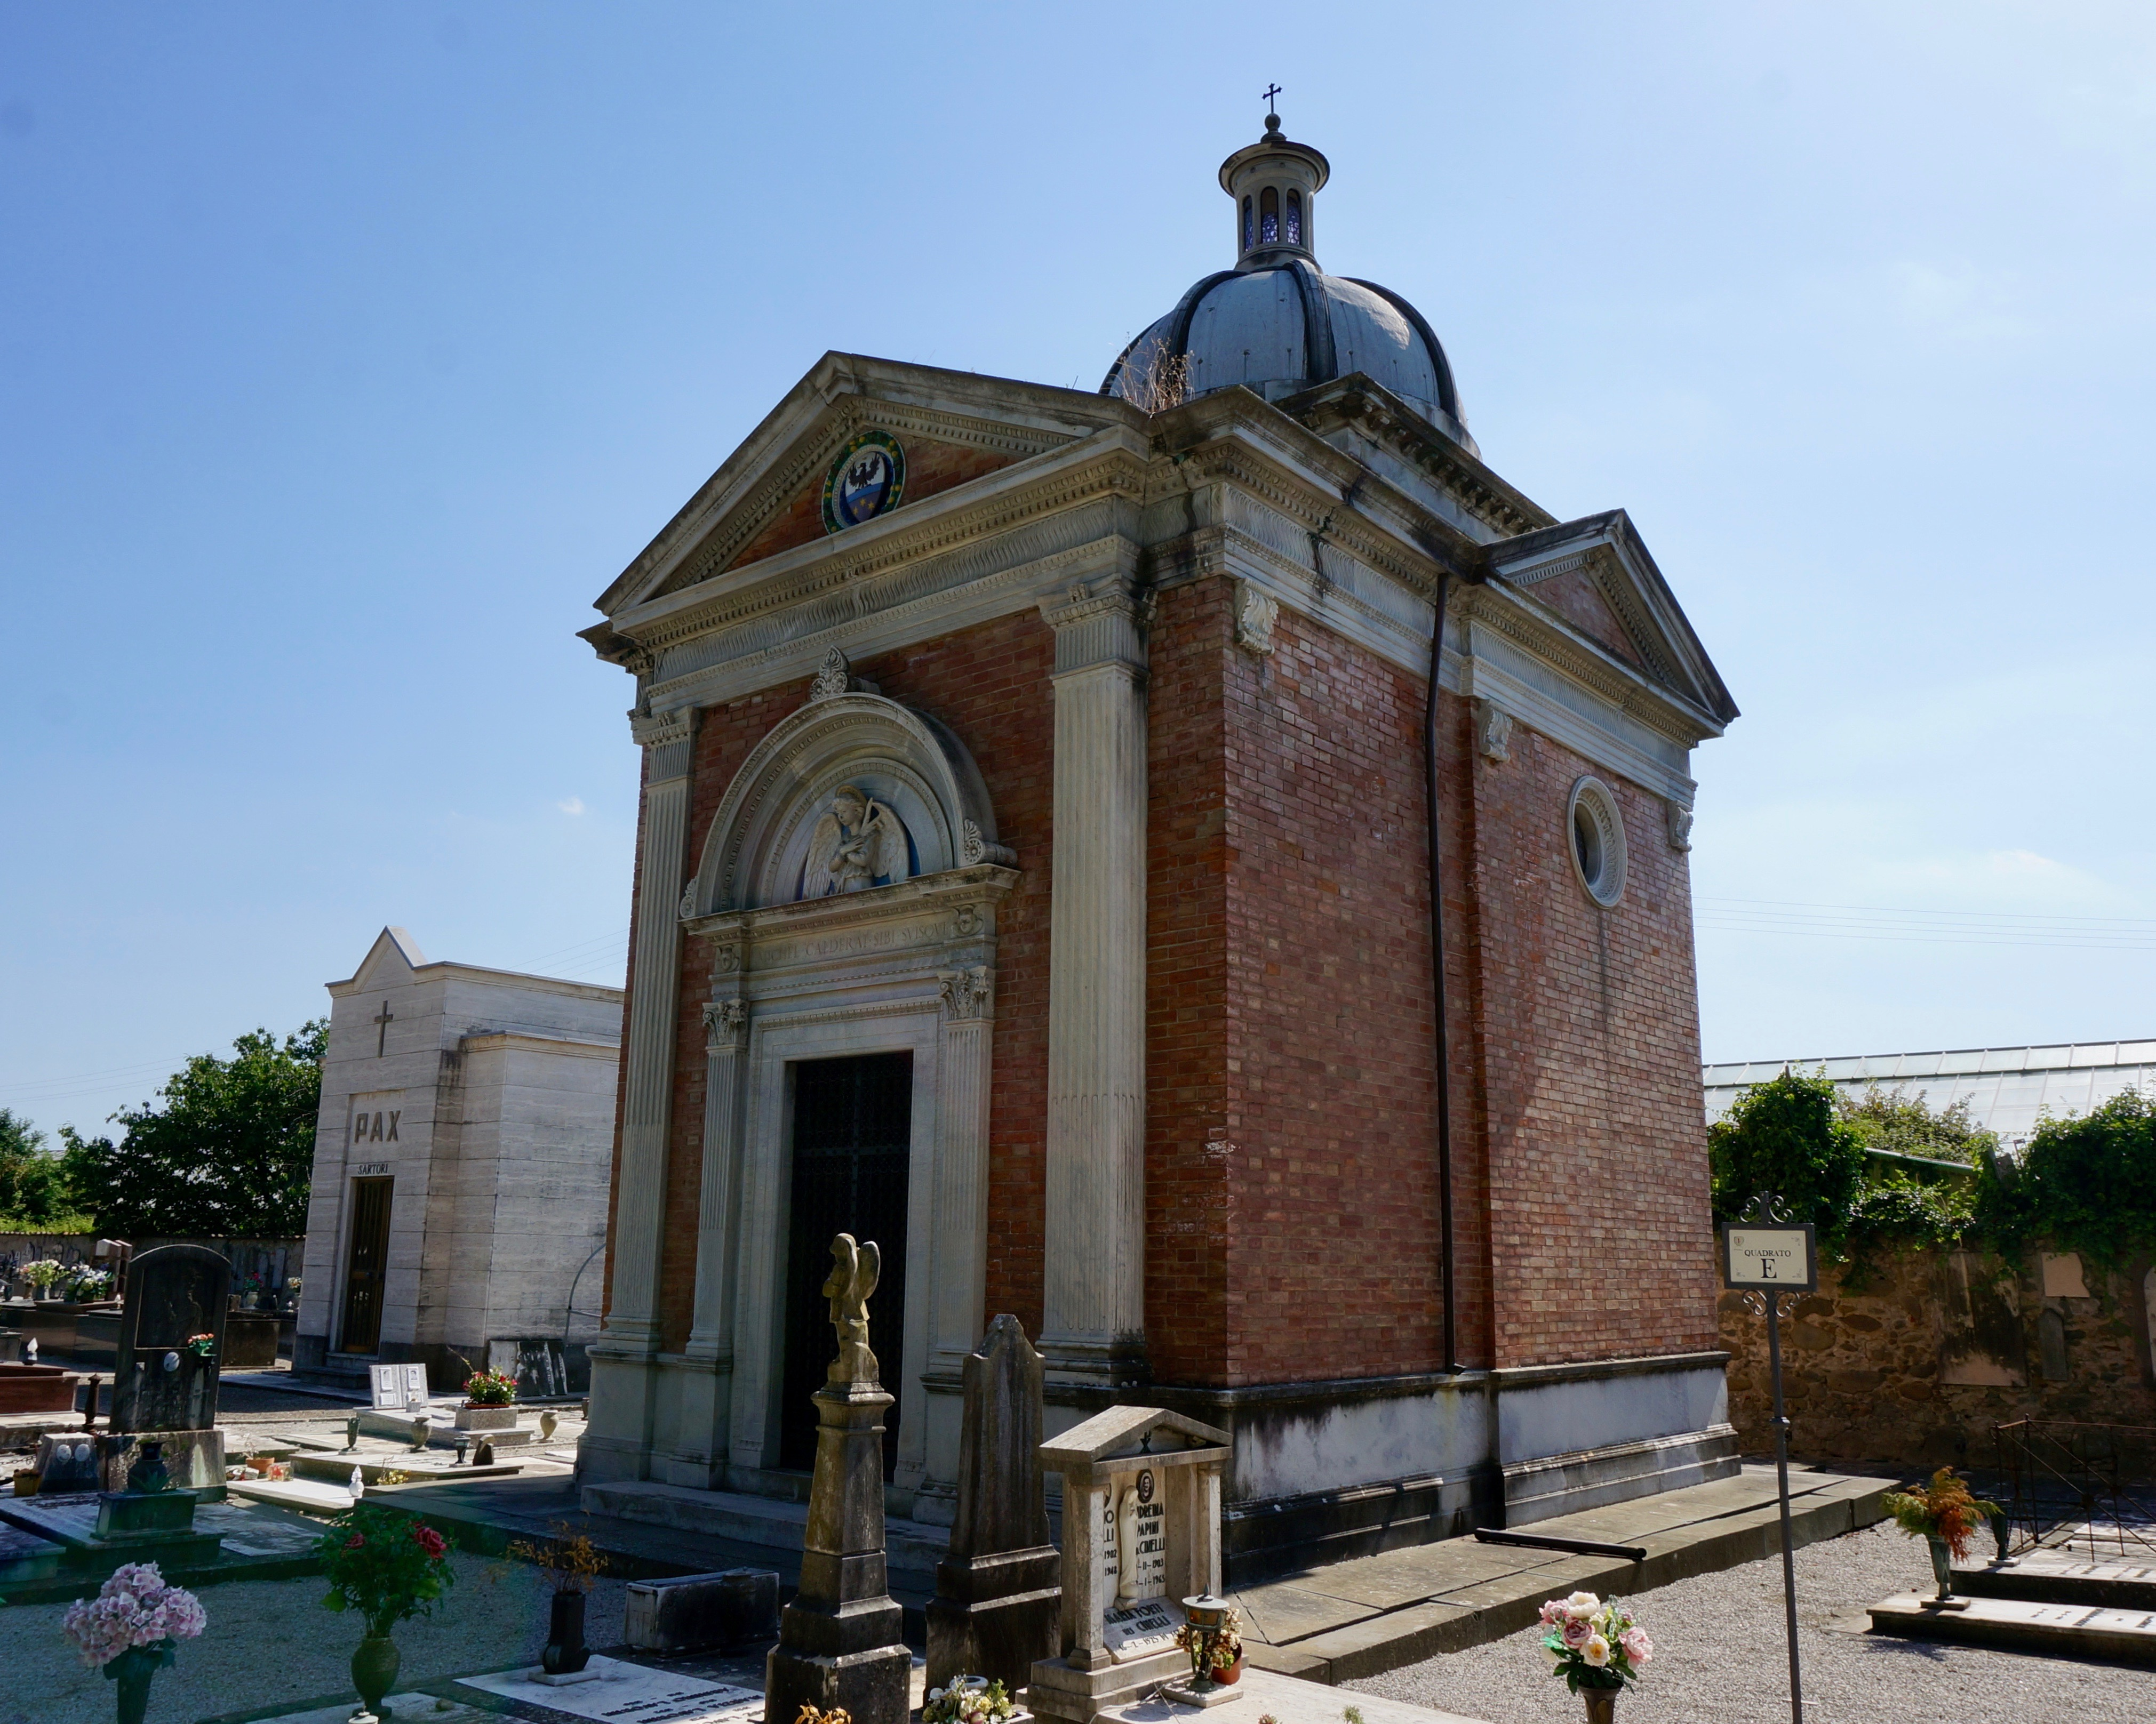 cappella Calderai cimitero monumentale pescia